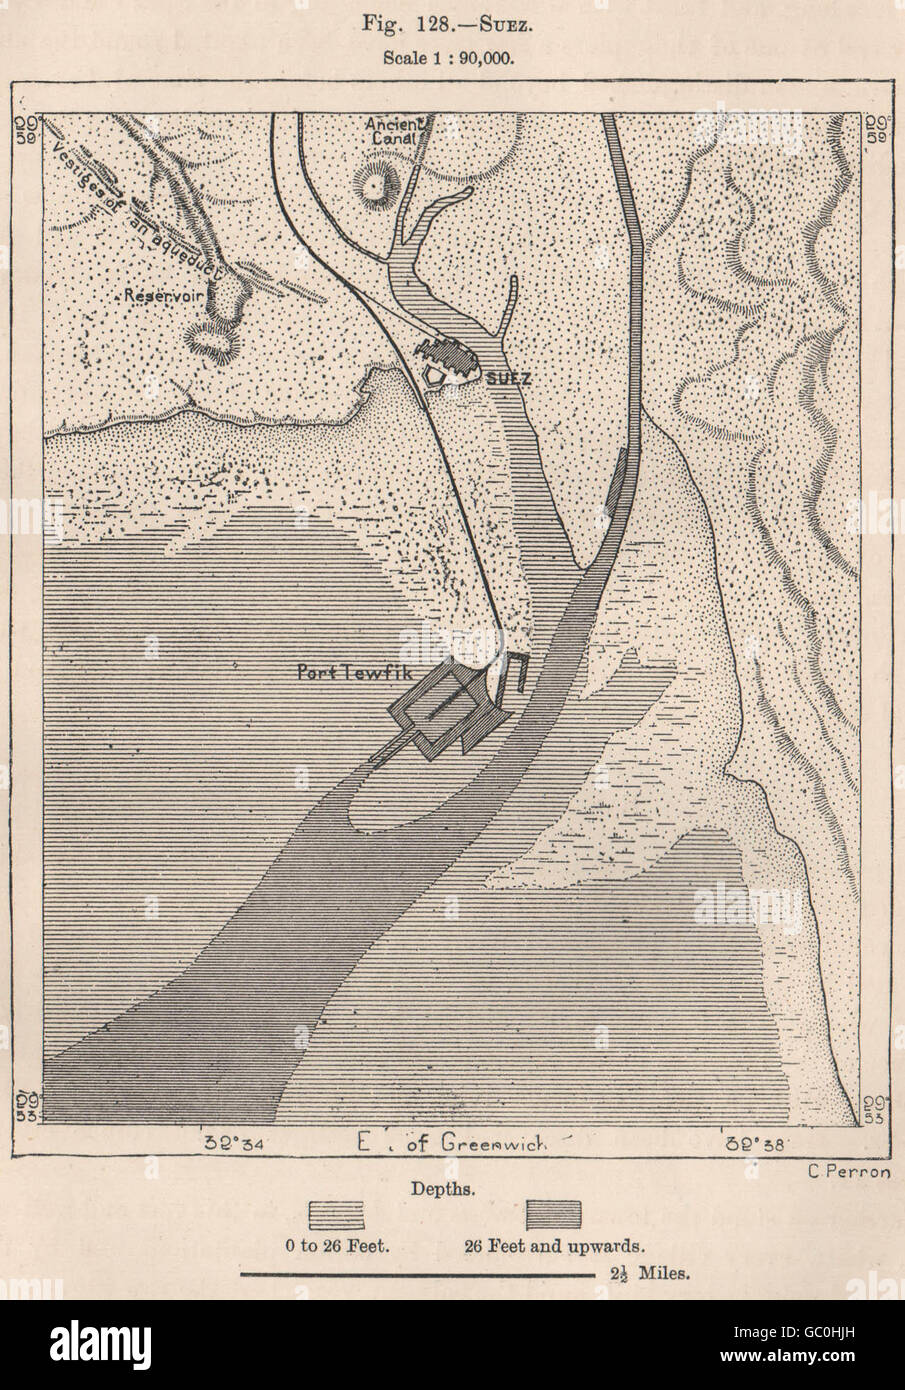 Suez. Egypt, 1885 antique map Stock Photo: 110651929 - Alamy on naqada map, beirut map, library of alexandria map, tokyo map, djibouti map, strait of hormuz map, pithom map, red sea map, ras gharib map, sinai map, jerusalem map, bombay map, assiut map, khartoum map, aden map, giza egypt map, middle east map, mogadishu map, elburz mountains map, bay of bengal map,